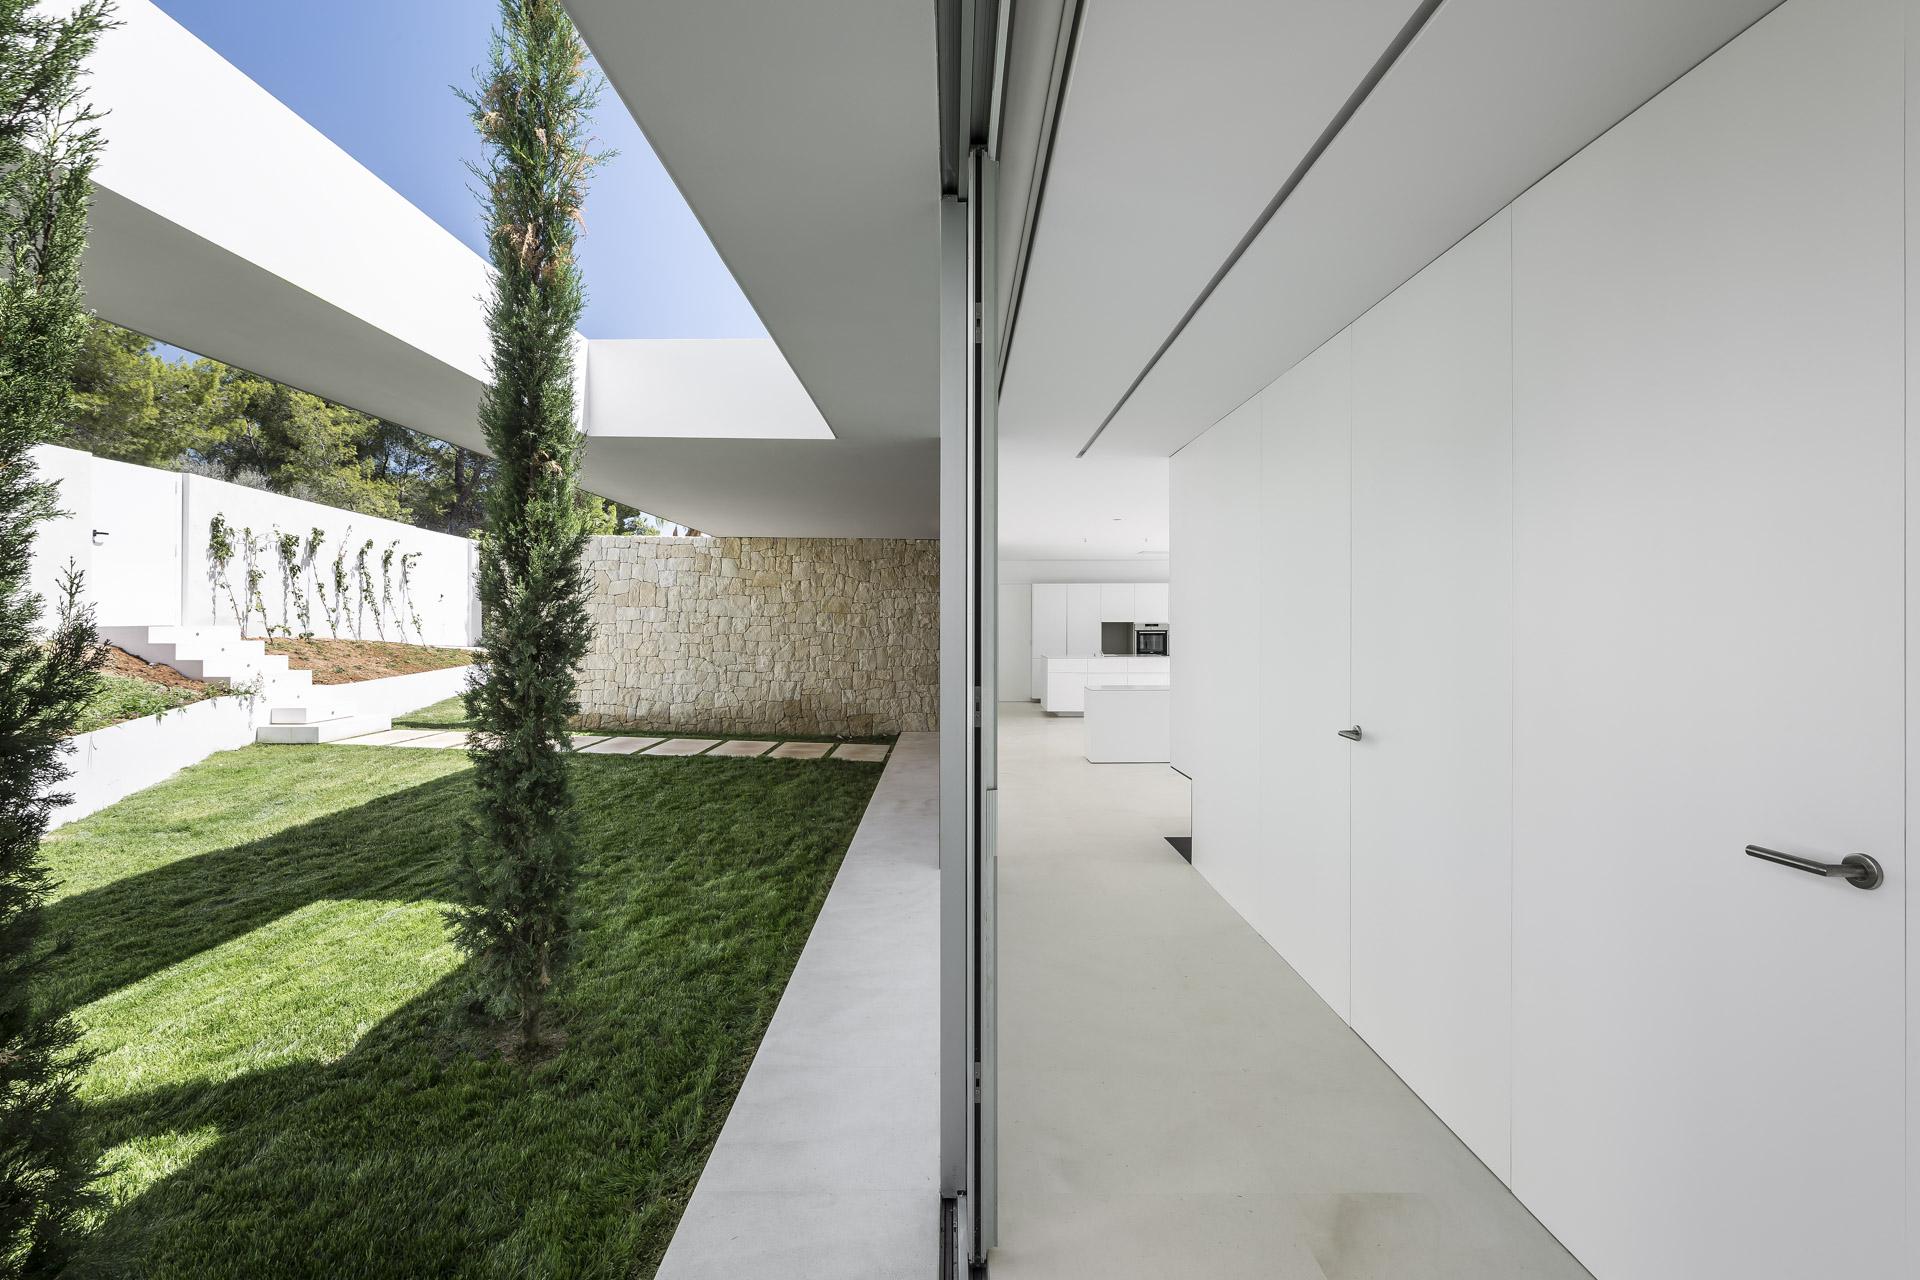 fotografia-arquitectura-valencia-german-cabo-gallardo-llopis-villamarchante-vivienda-10